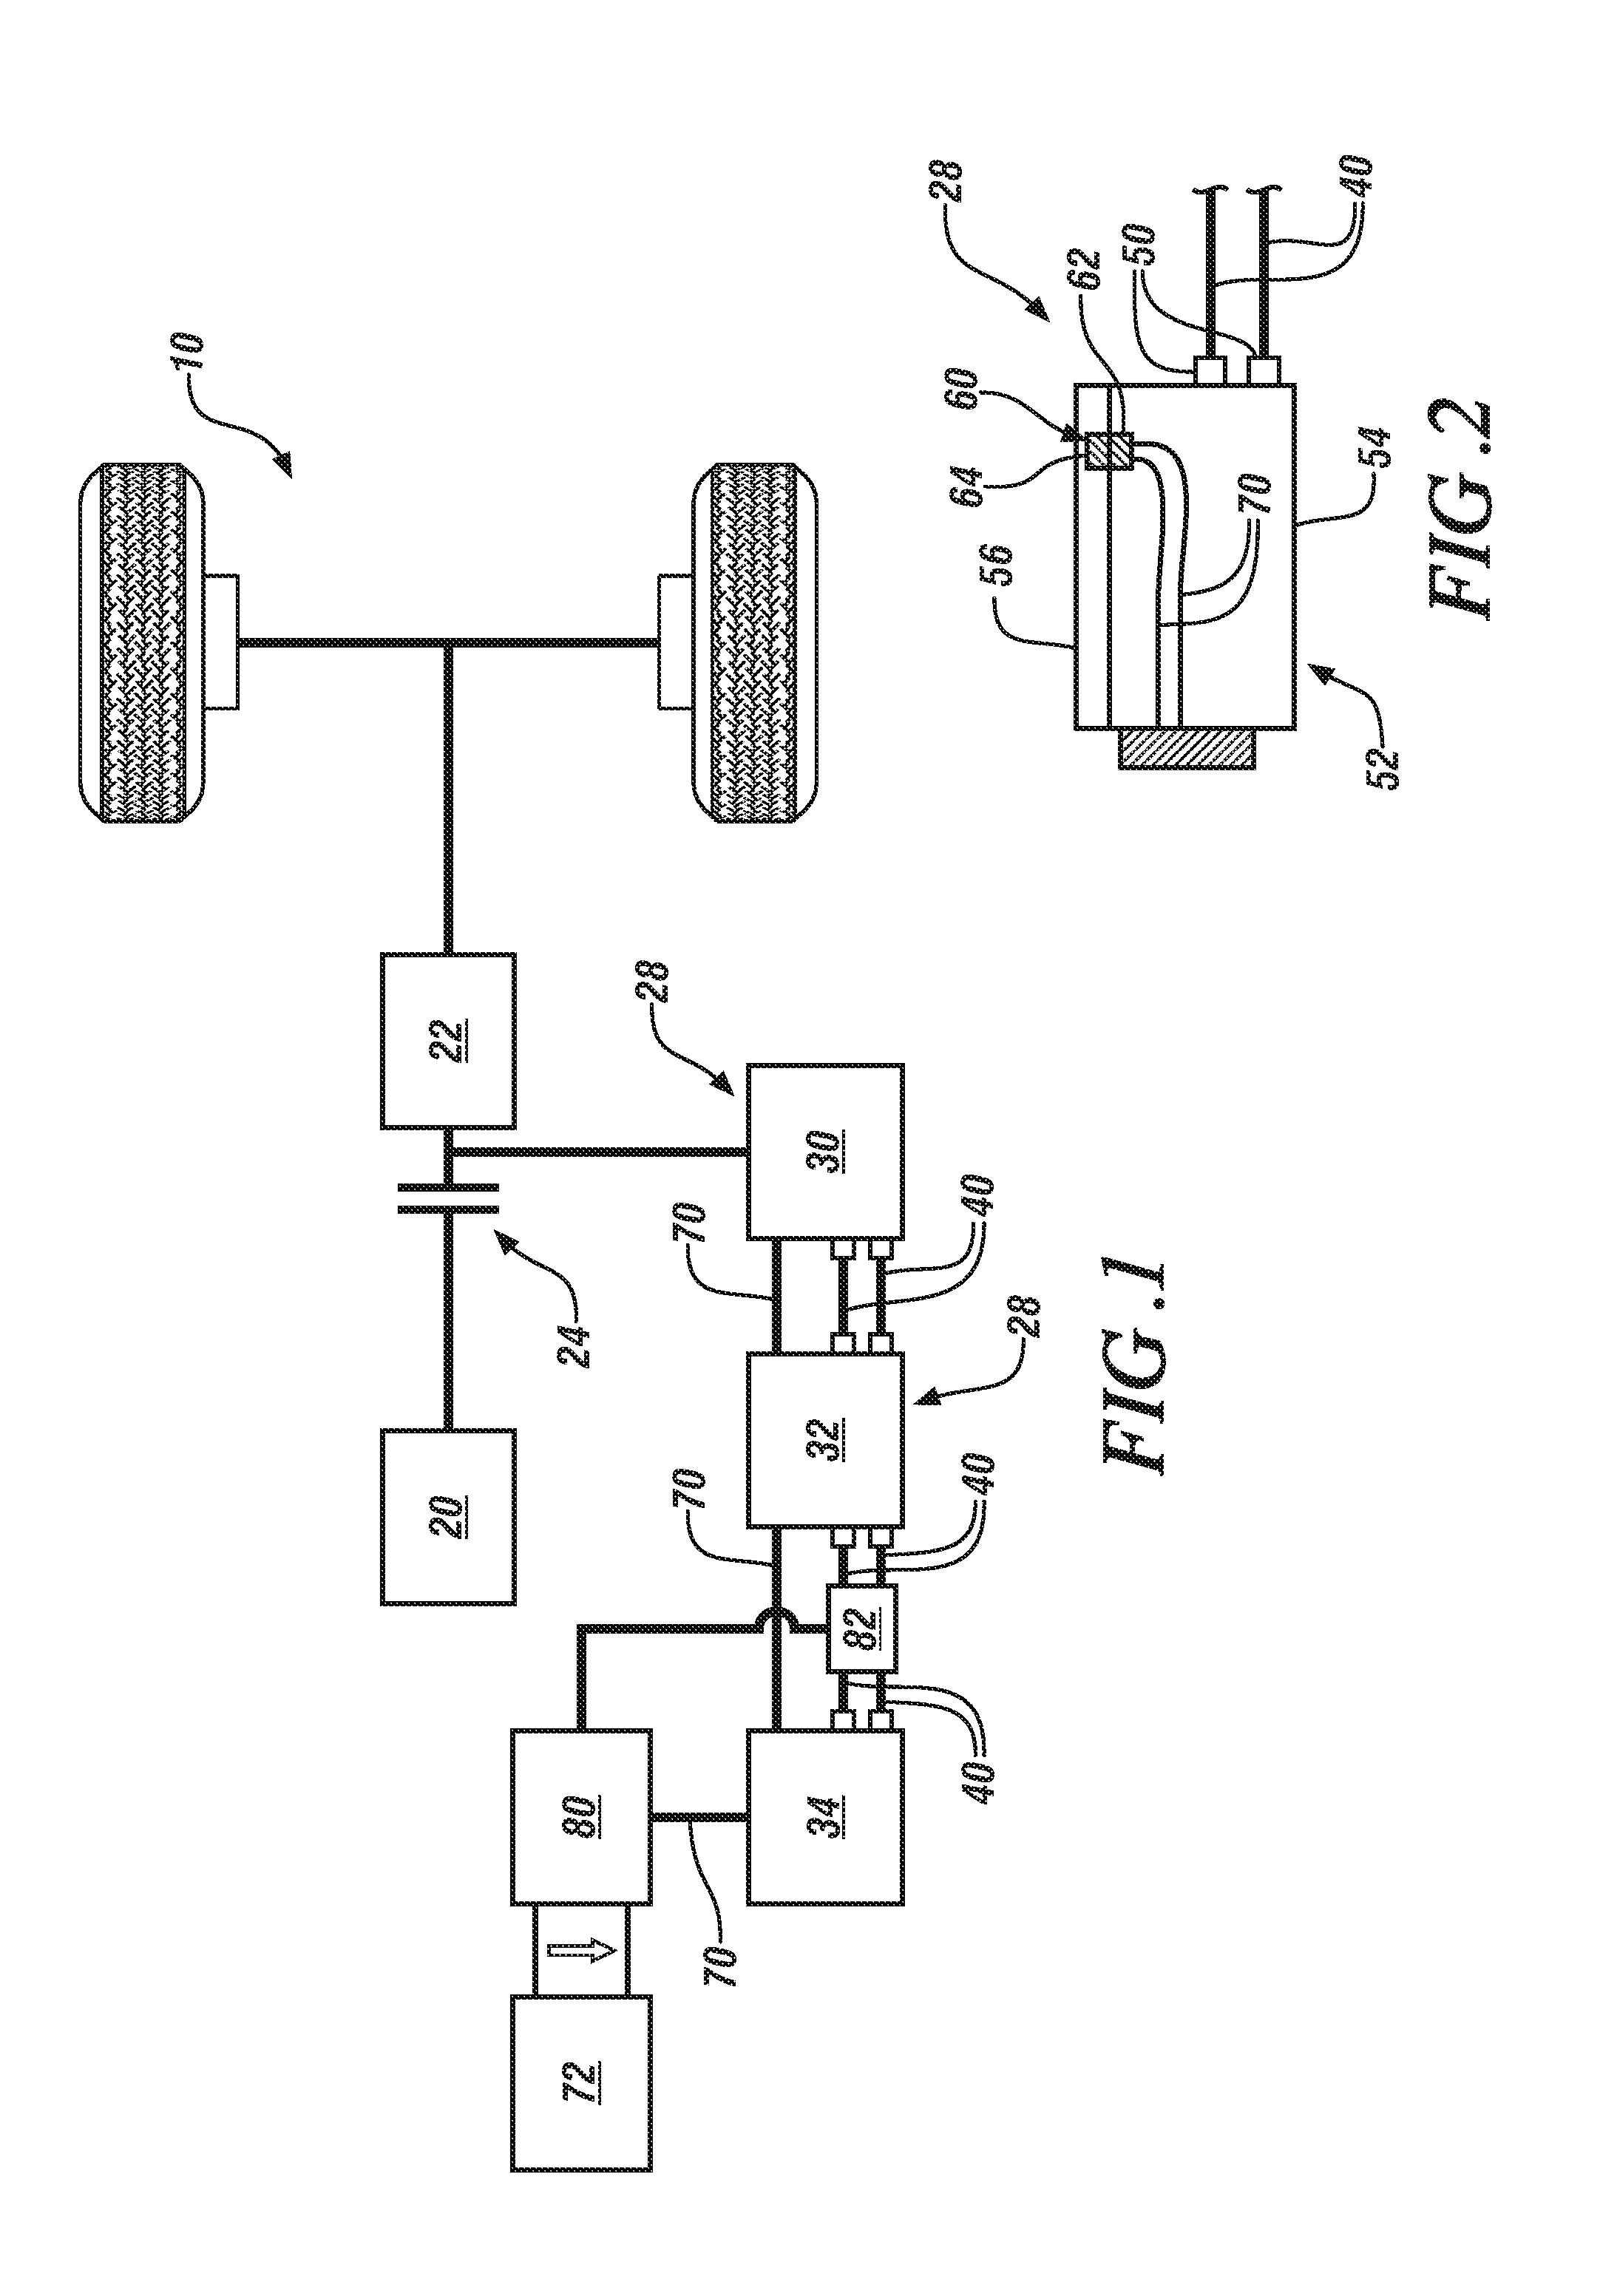 patent us20140062180 - high-voltage interlock loop   u0026quot hvil u0026quot   switch having a reed relay